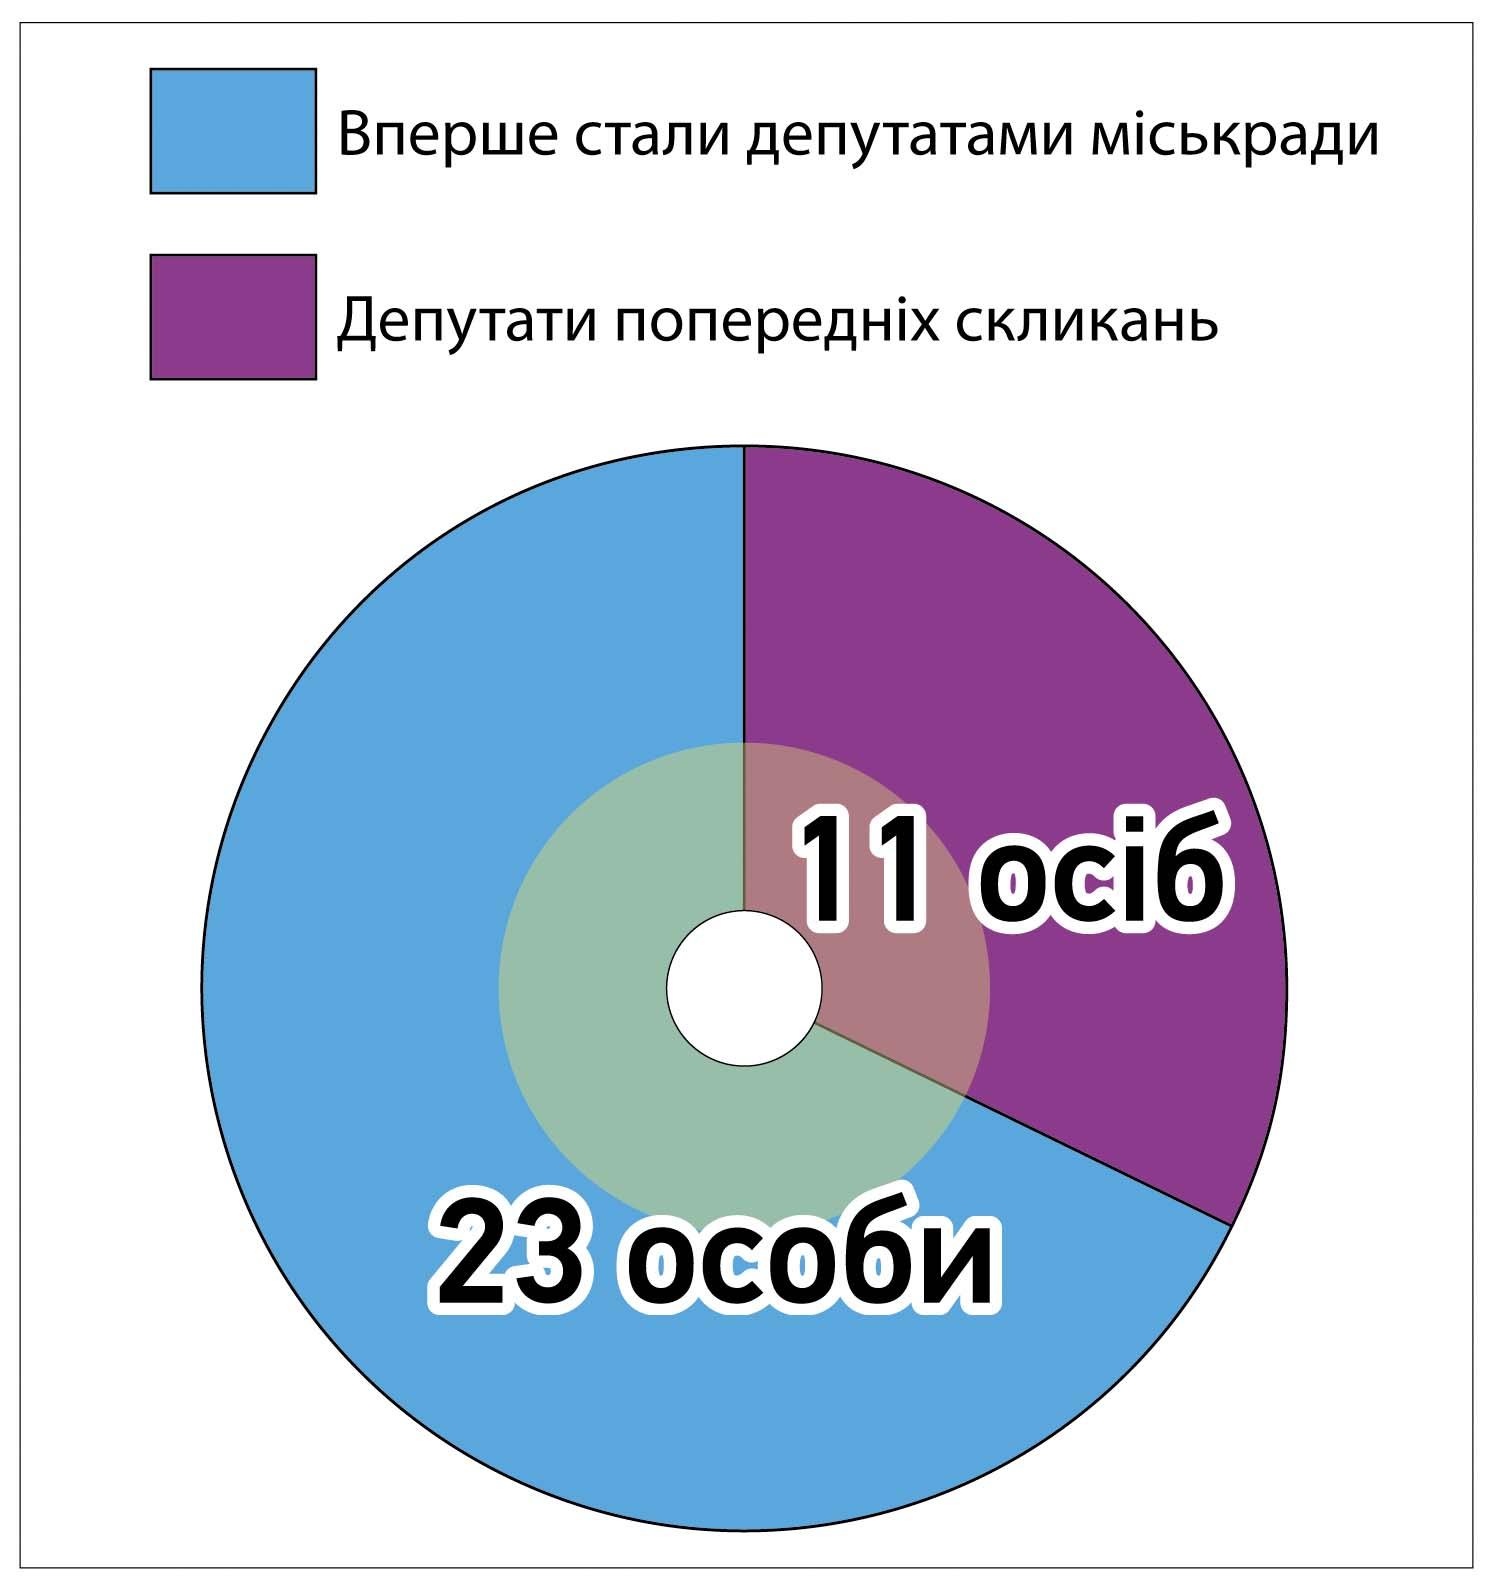 DzerKol20151030_047.indd